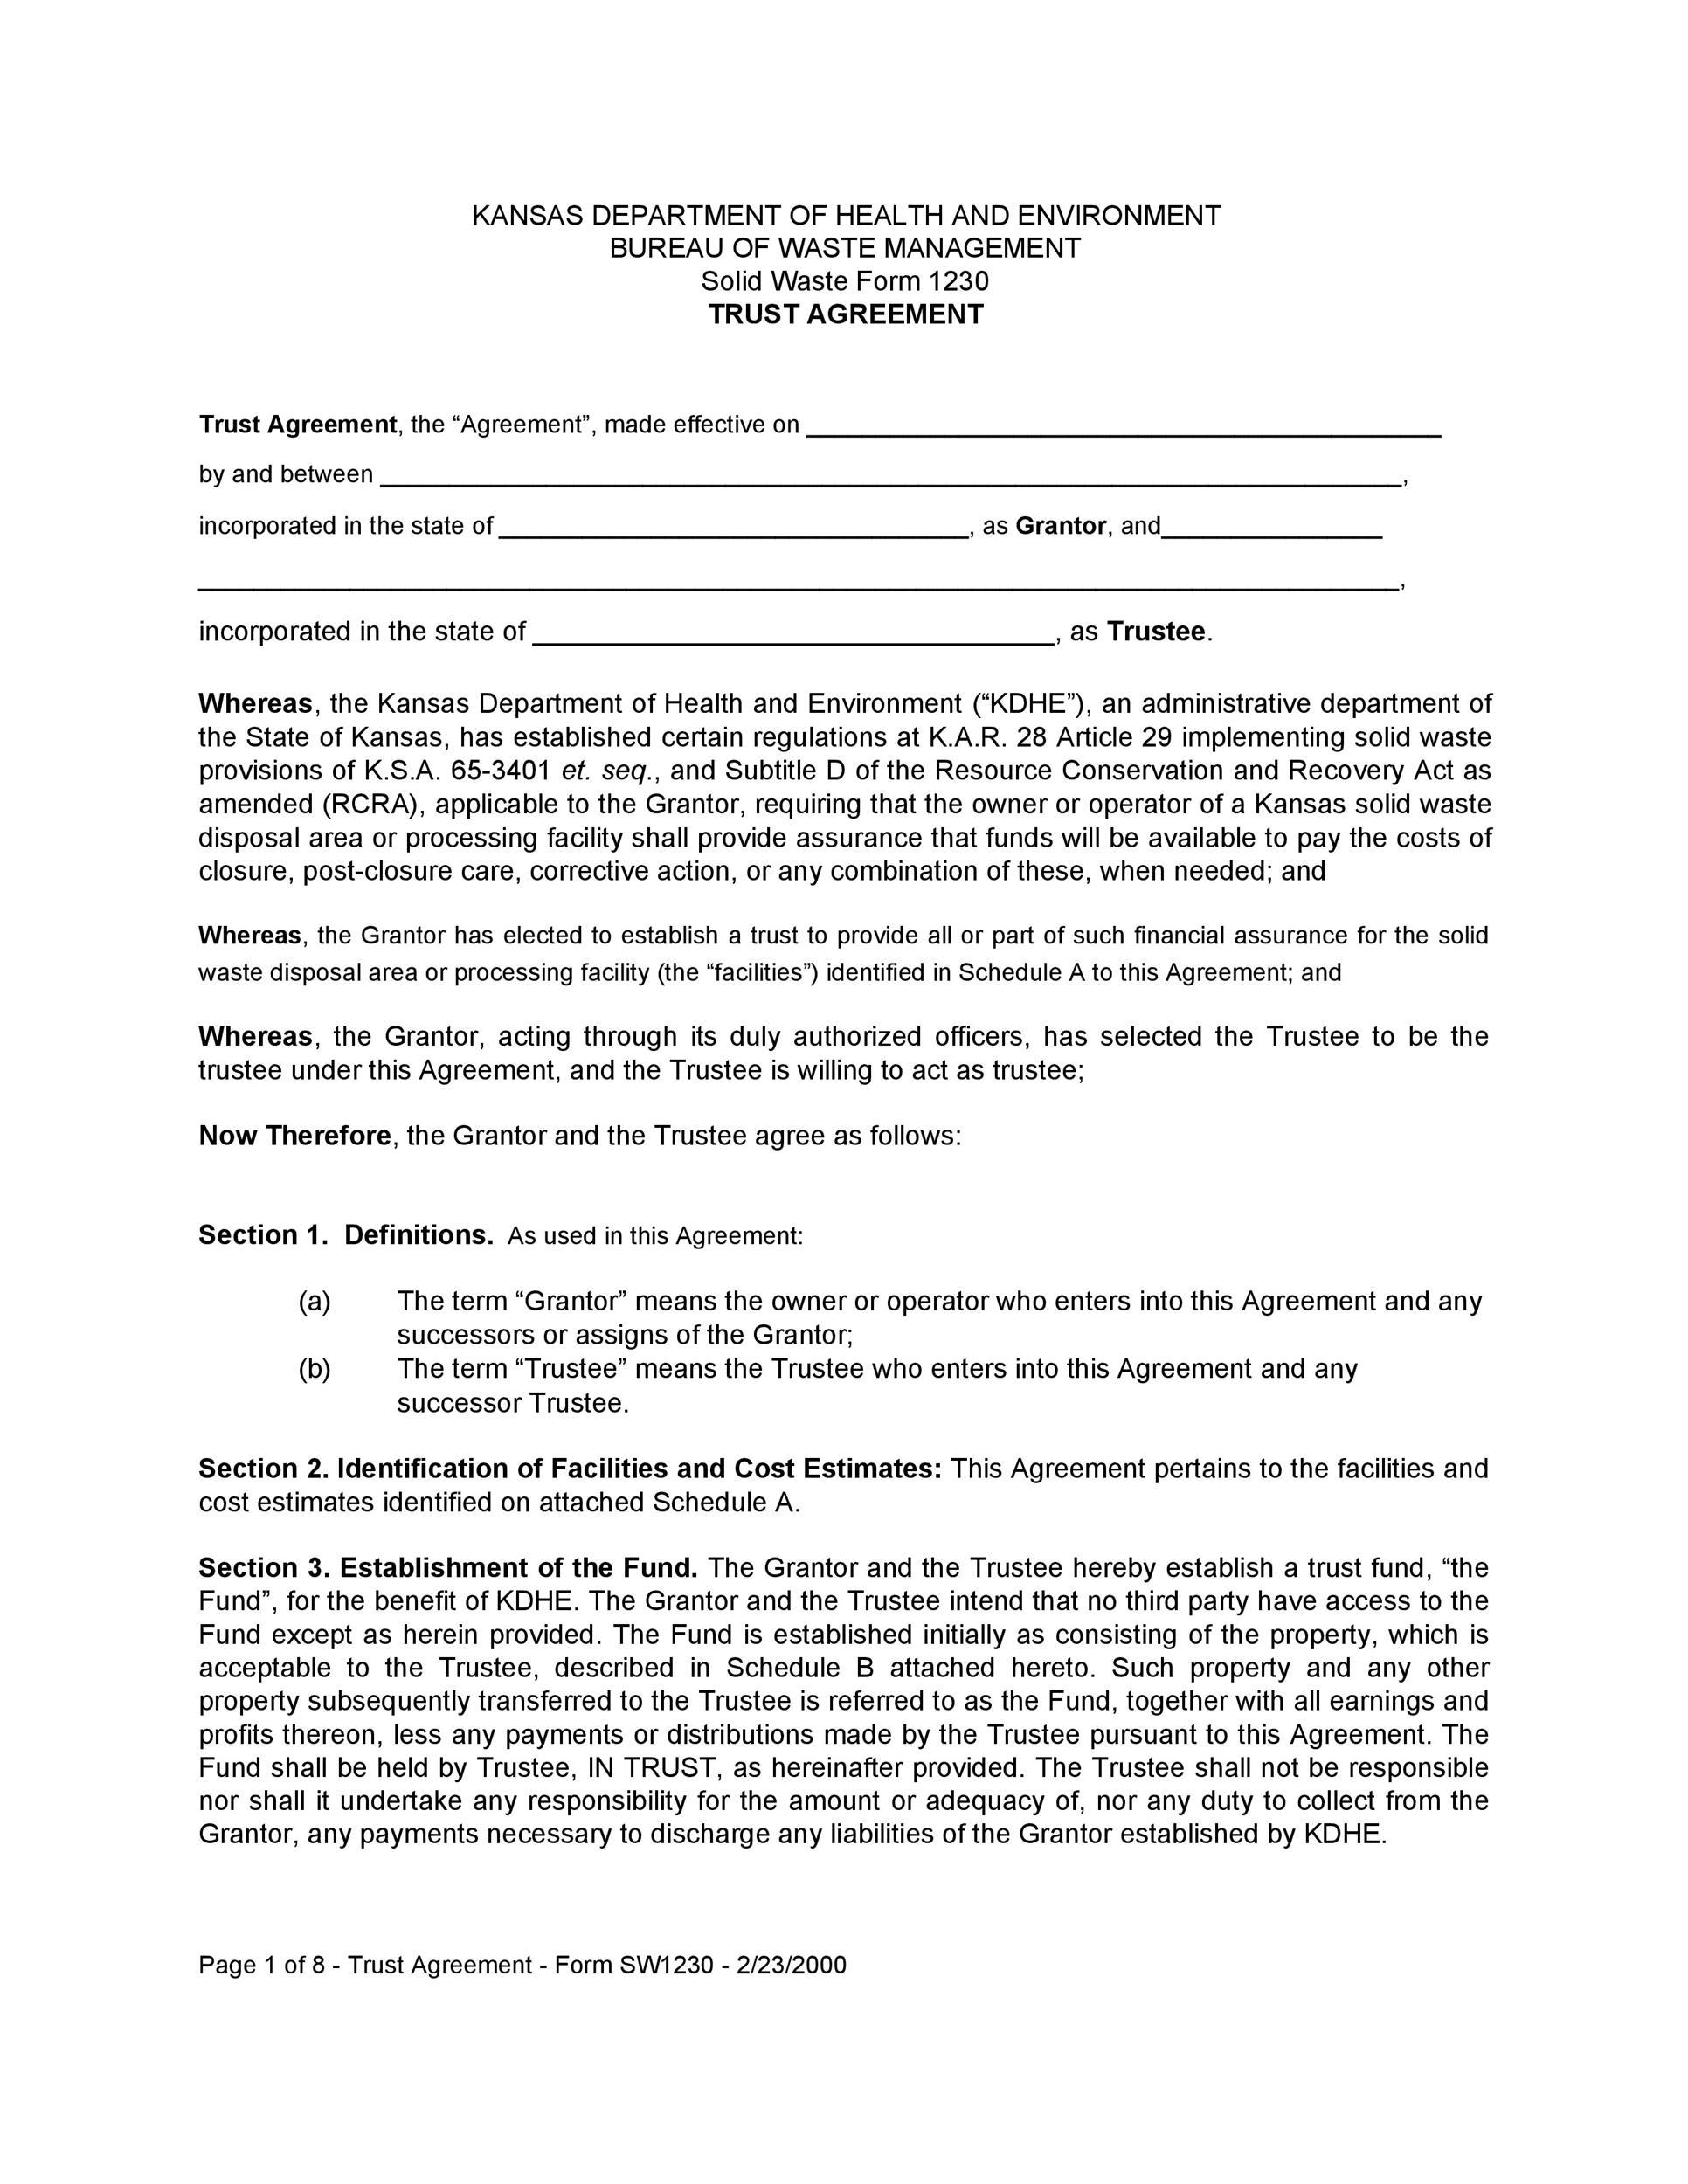 Free trust agreement 37